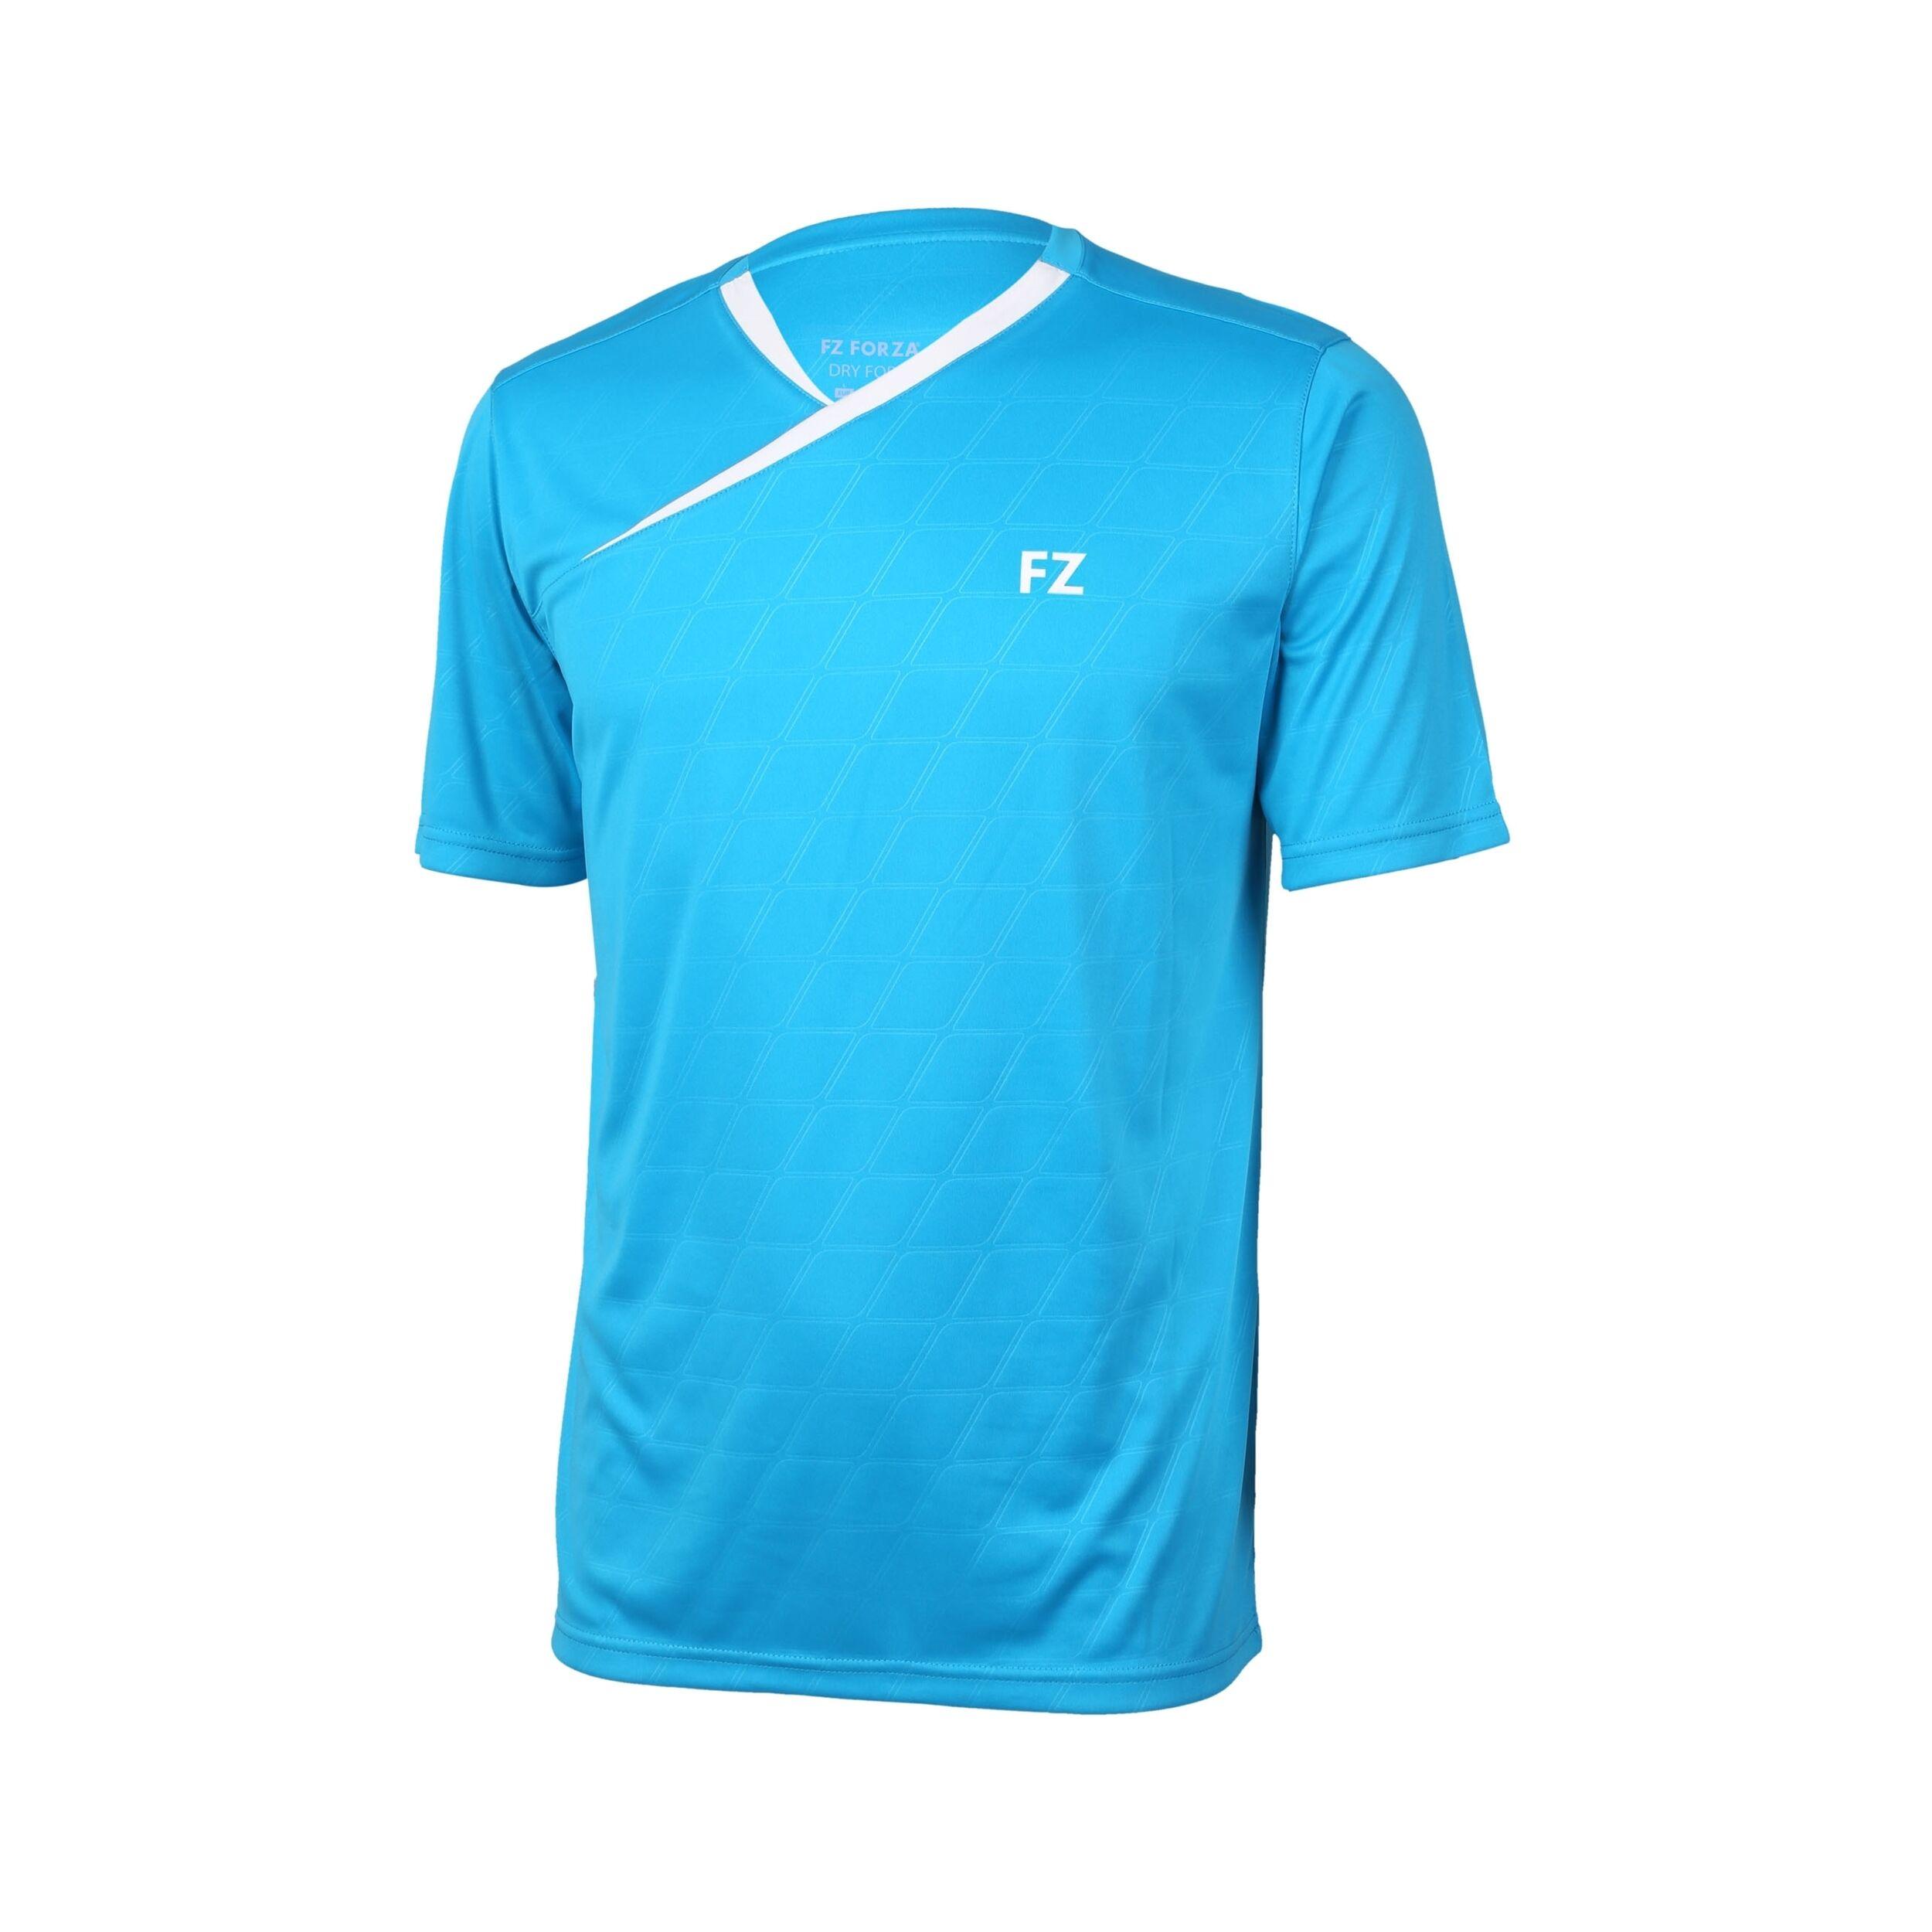 FZ Forza Byron T-shirt Atomic Teal S